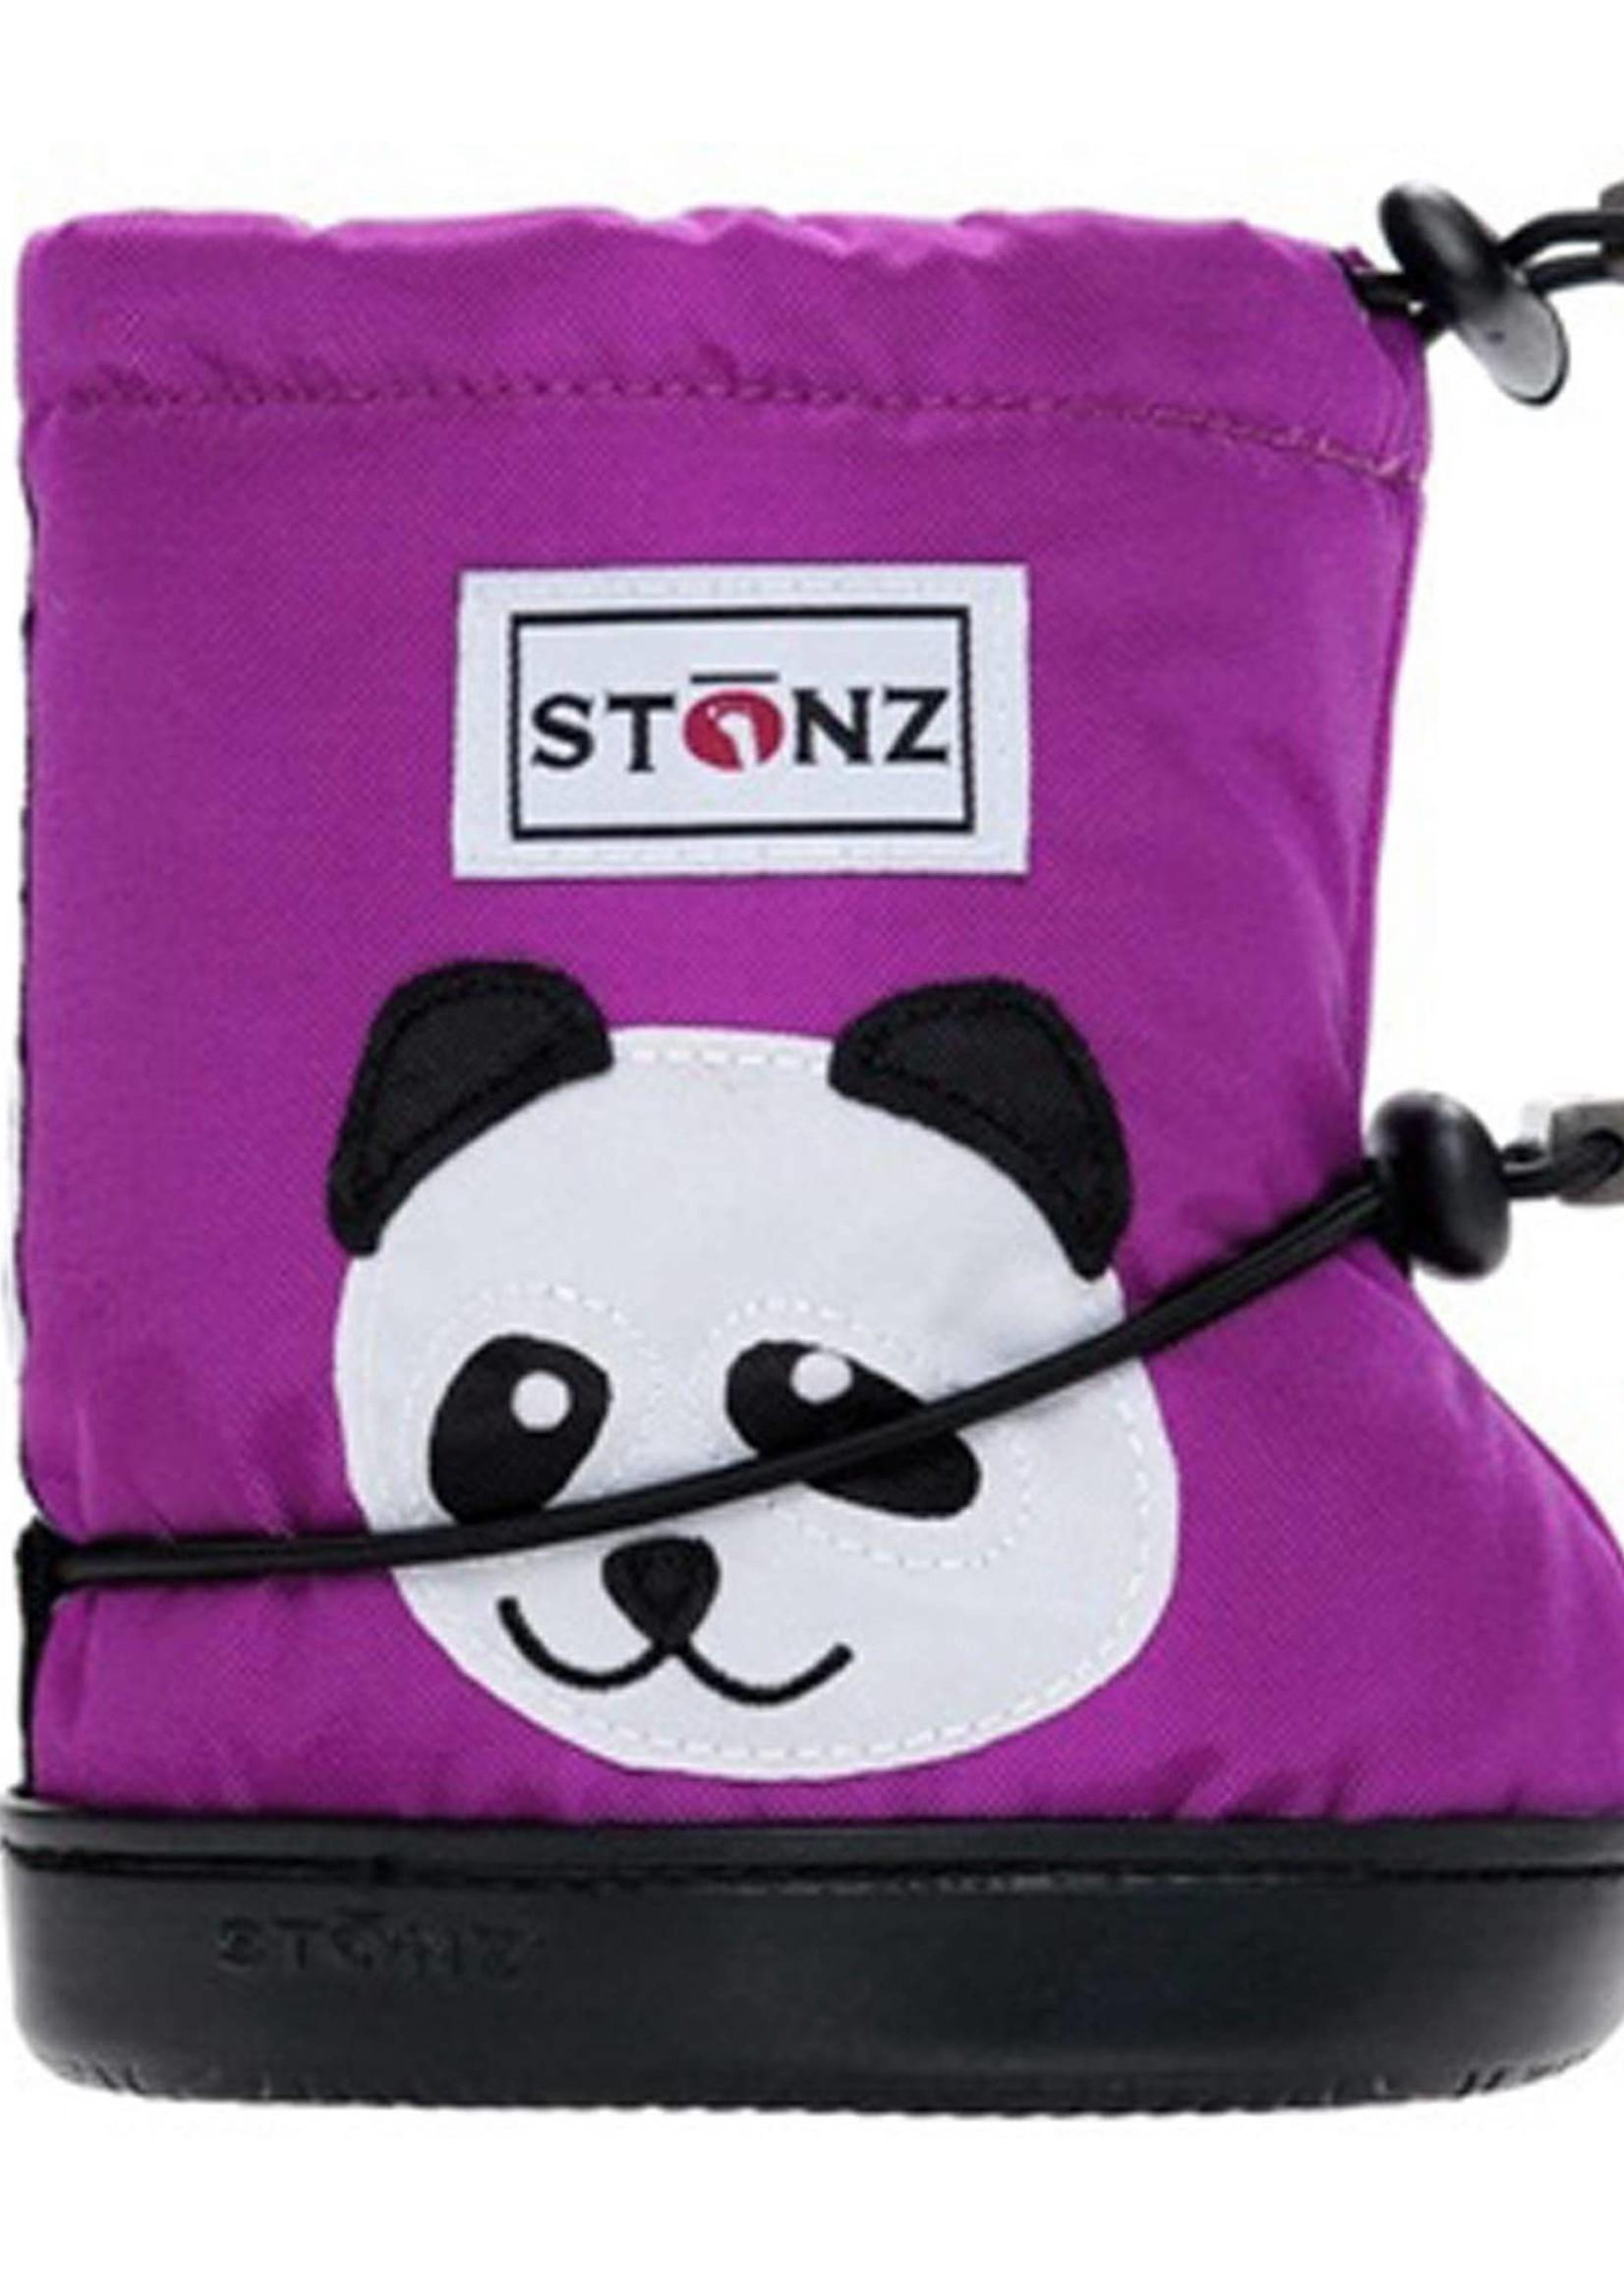 stonz Stonz Booties (2019)